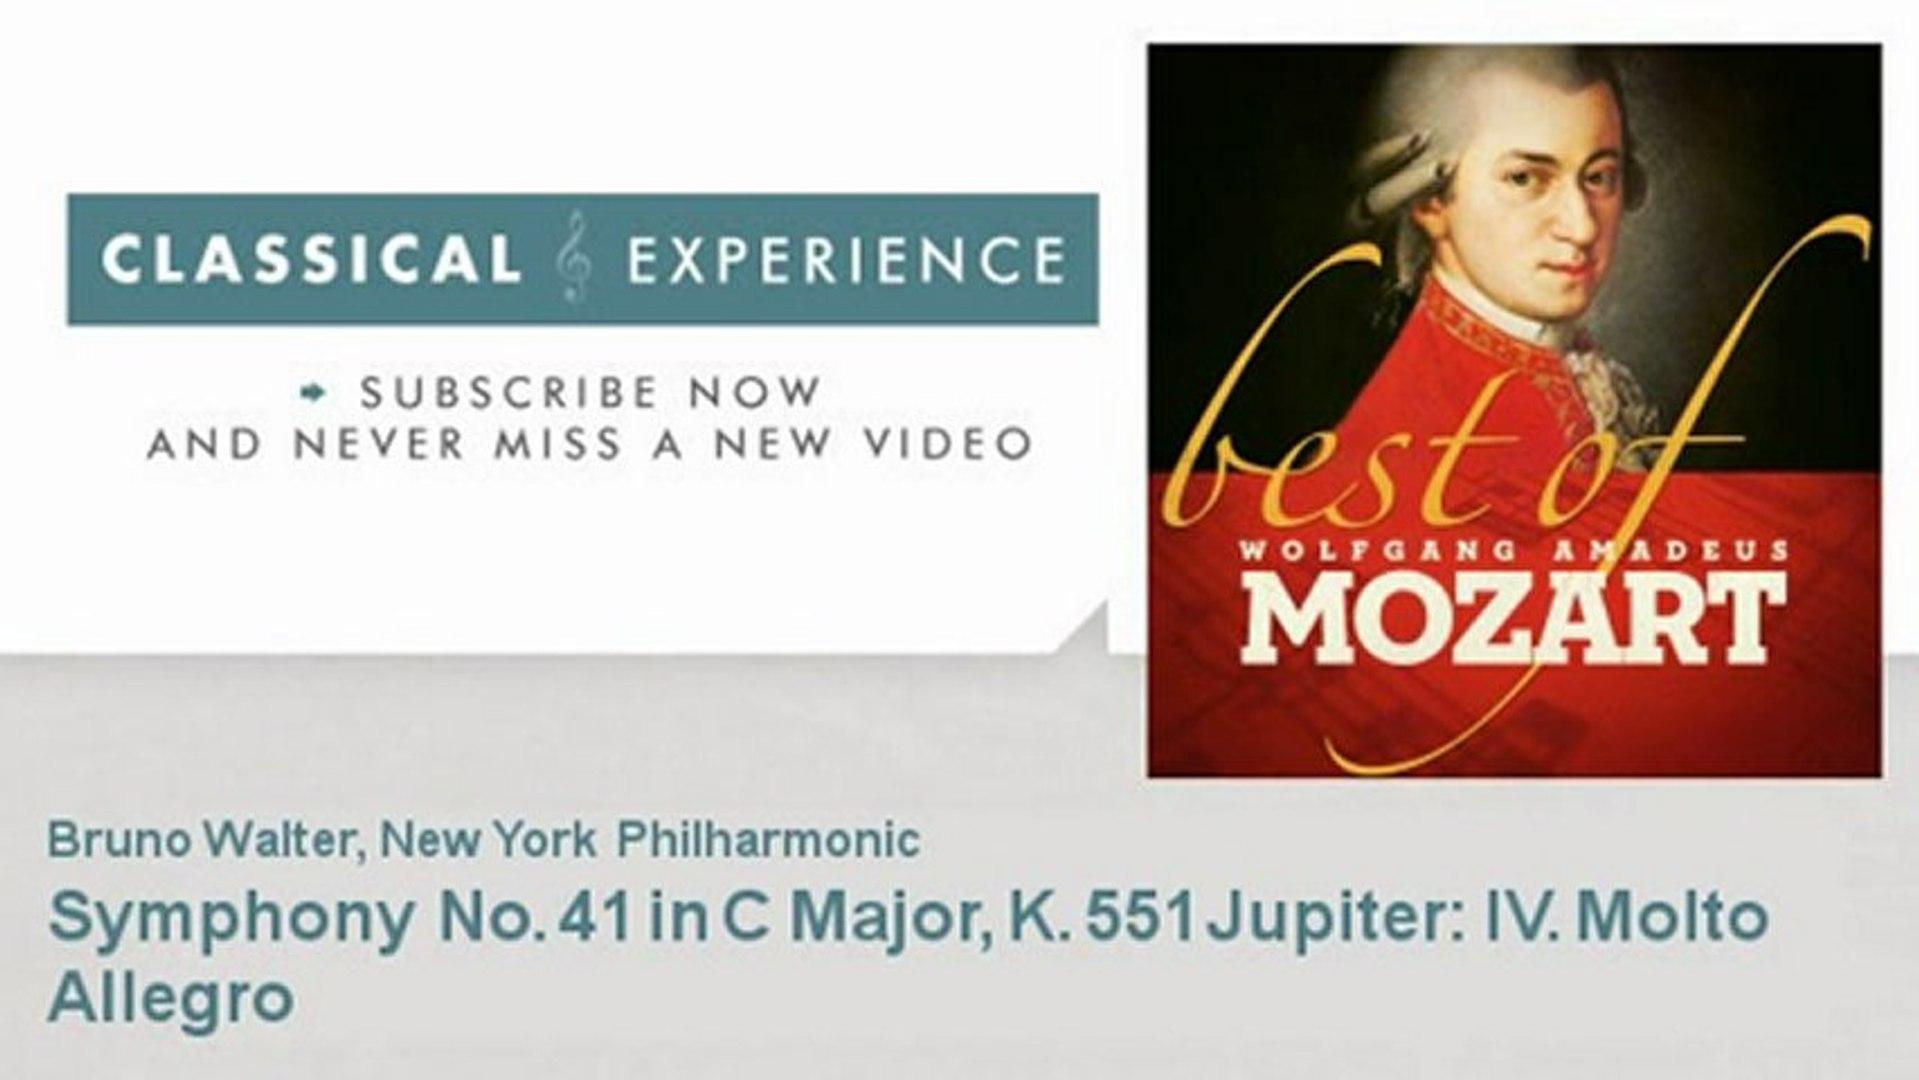 Wolfgang Amadeus Mozart : Symphony No  41 in C Major, K  551 Jupiter: IV   Molto Allegro